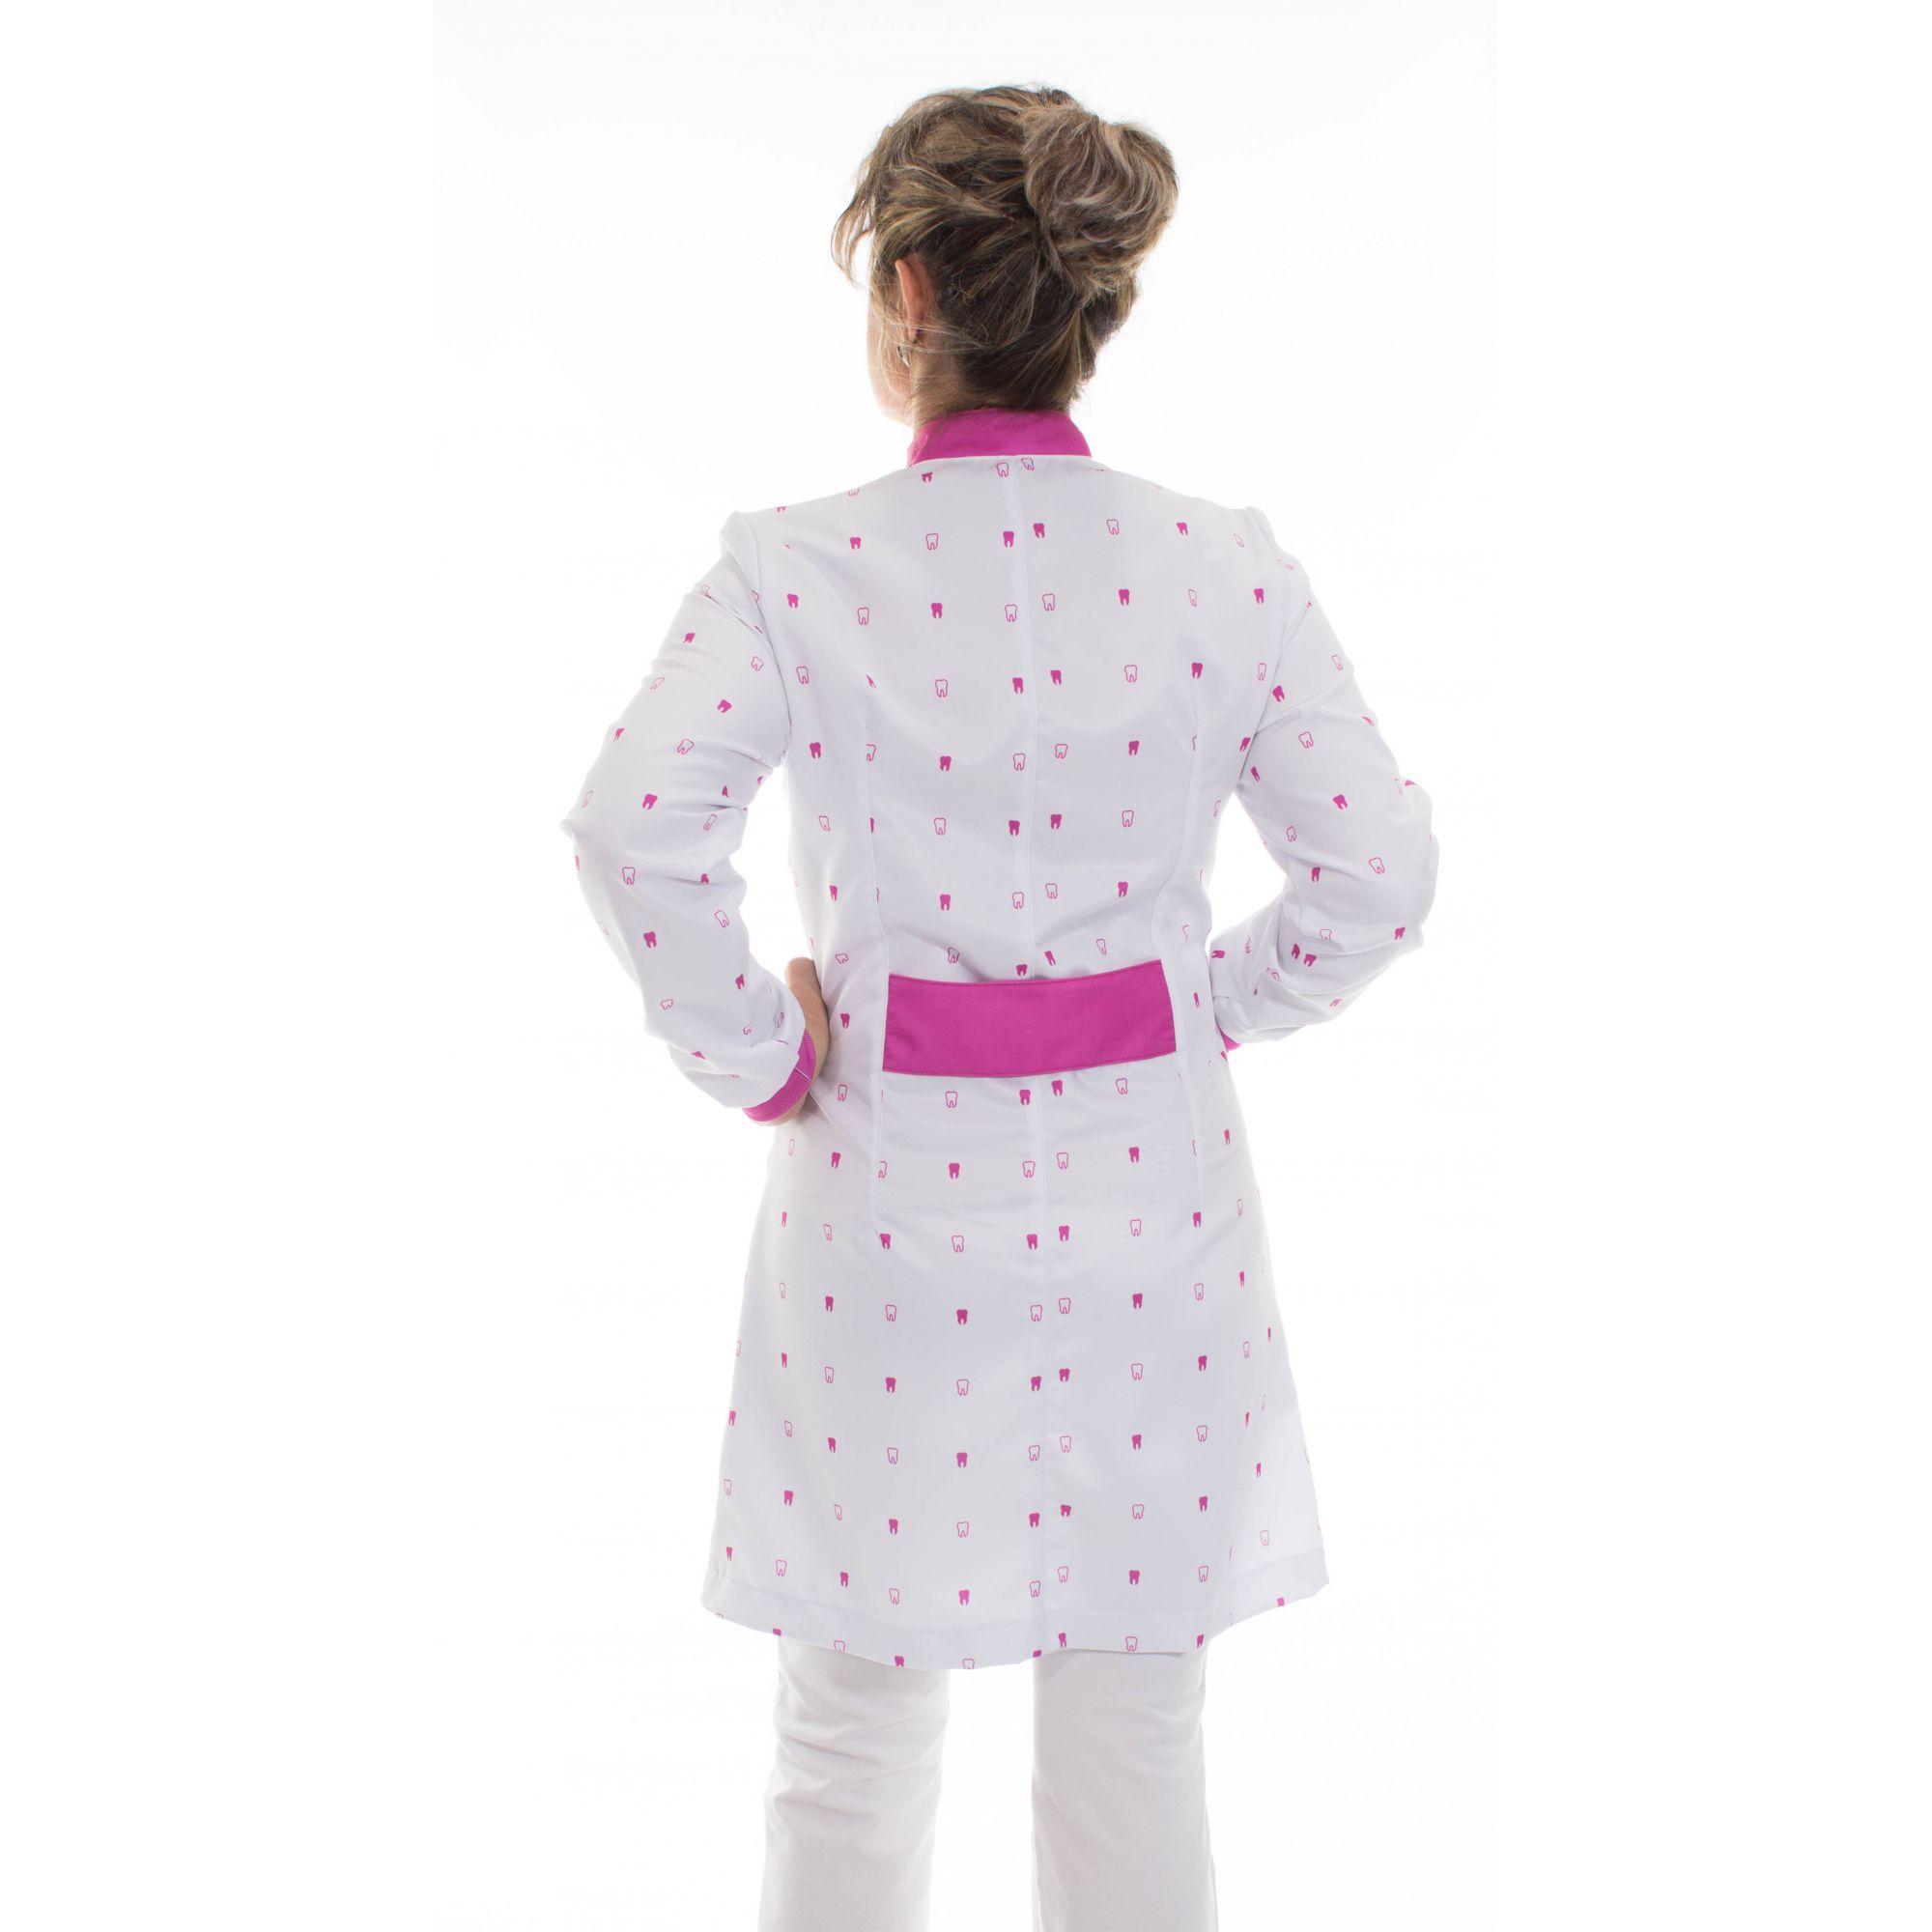 Jaleco estampado gola padre - Modelo Elegans Mini Dentes Pink